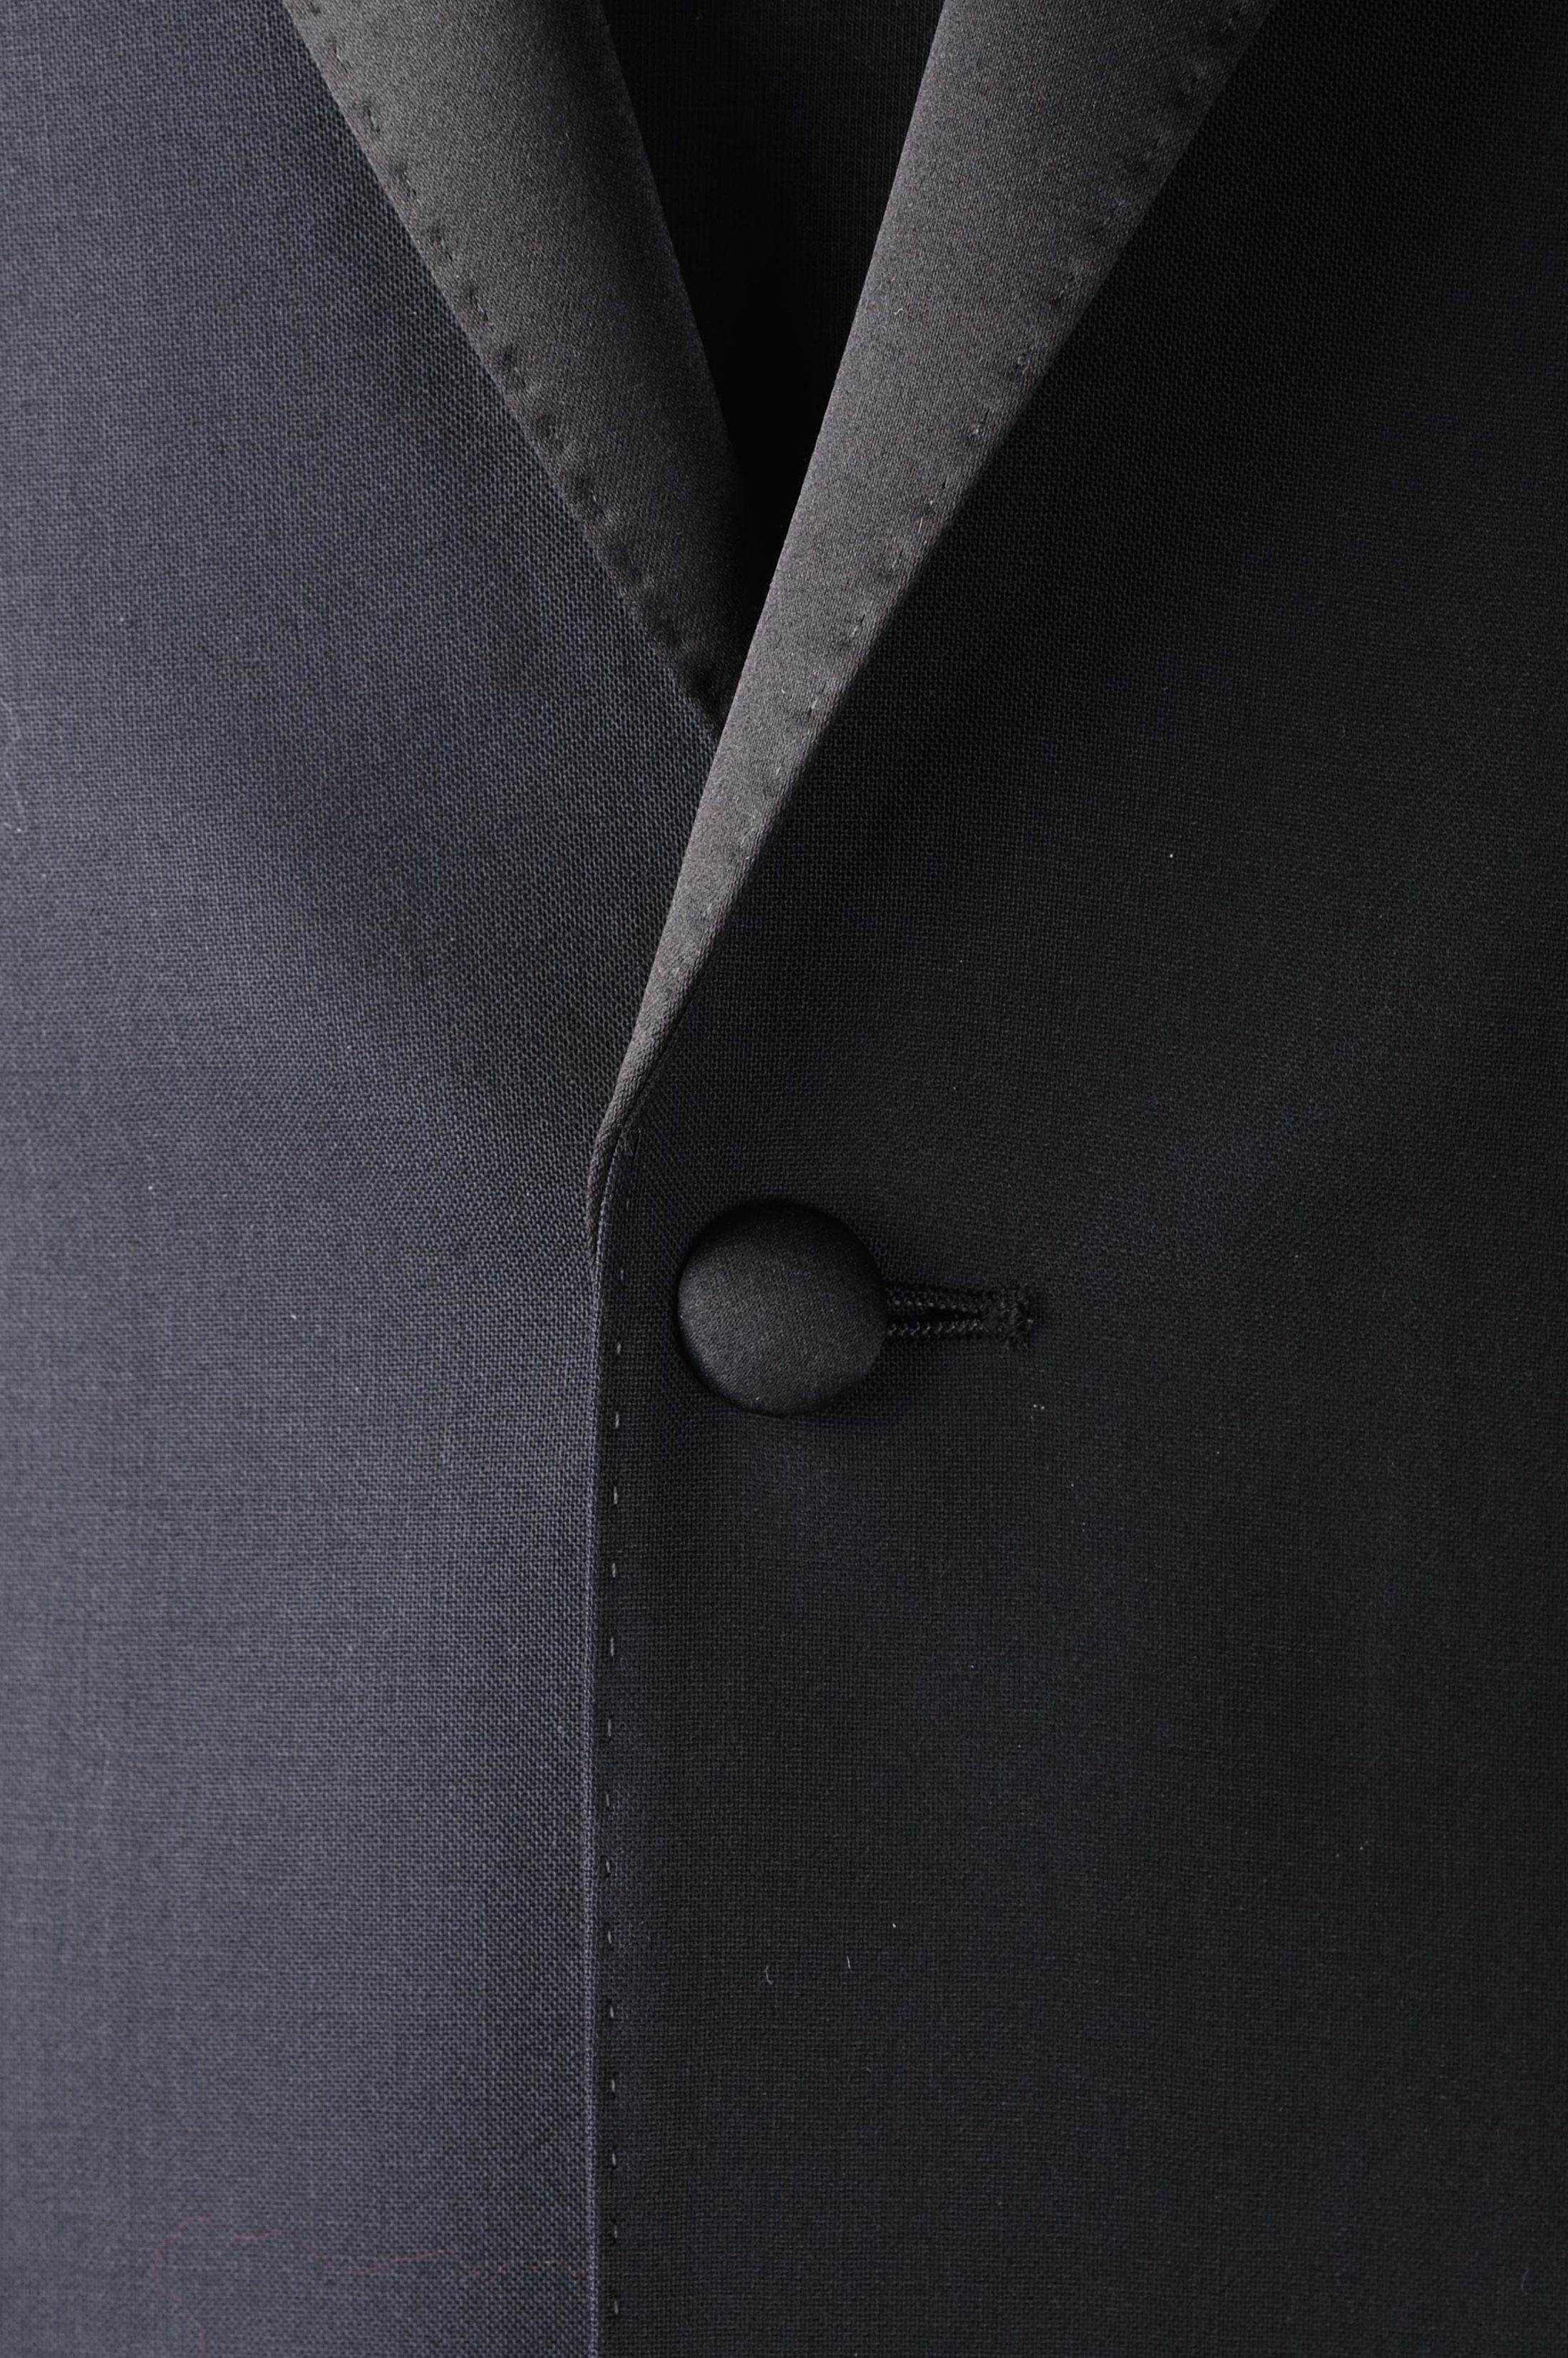 Suitable Smoking New York 100% Wool